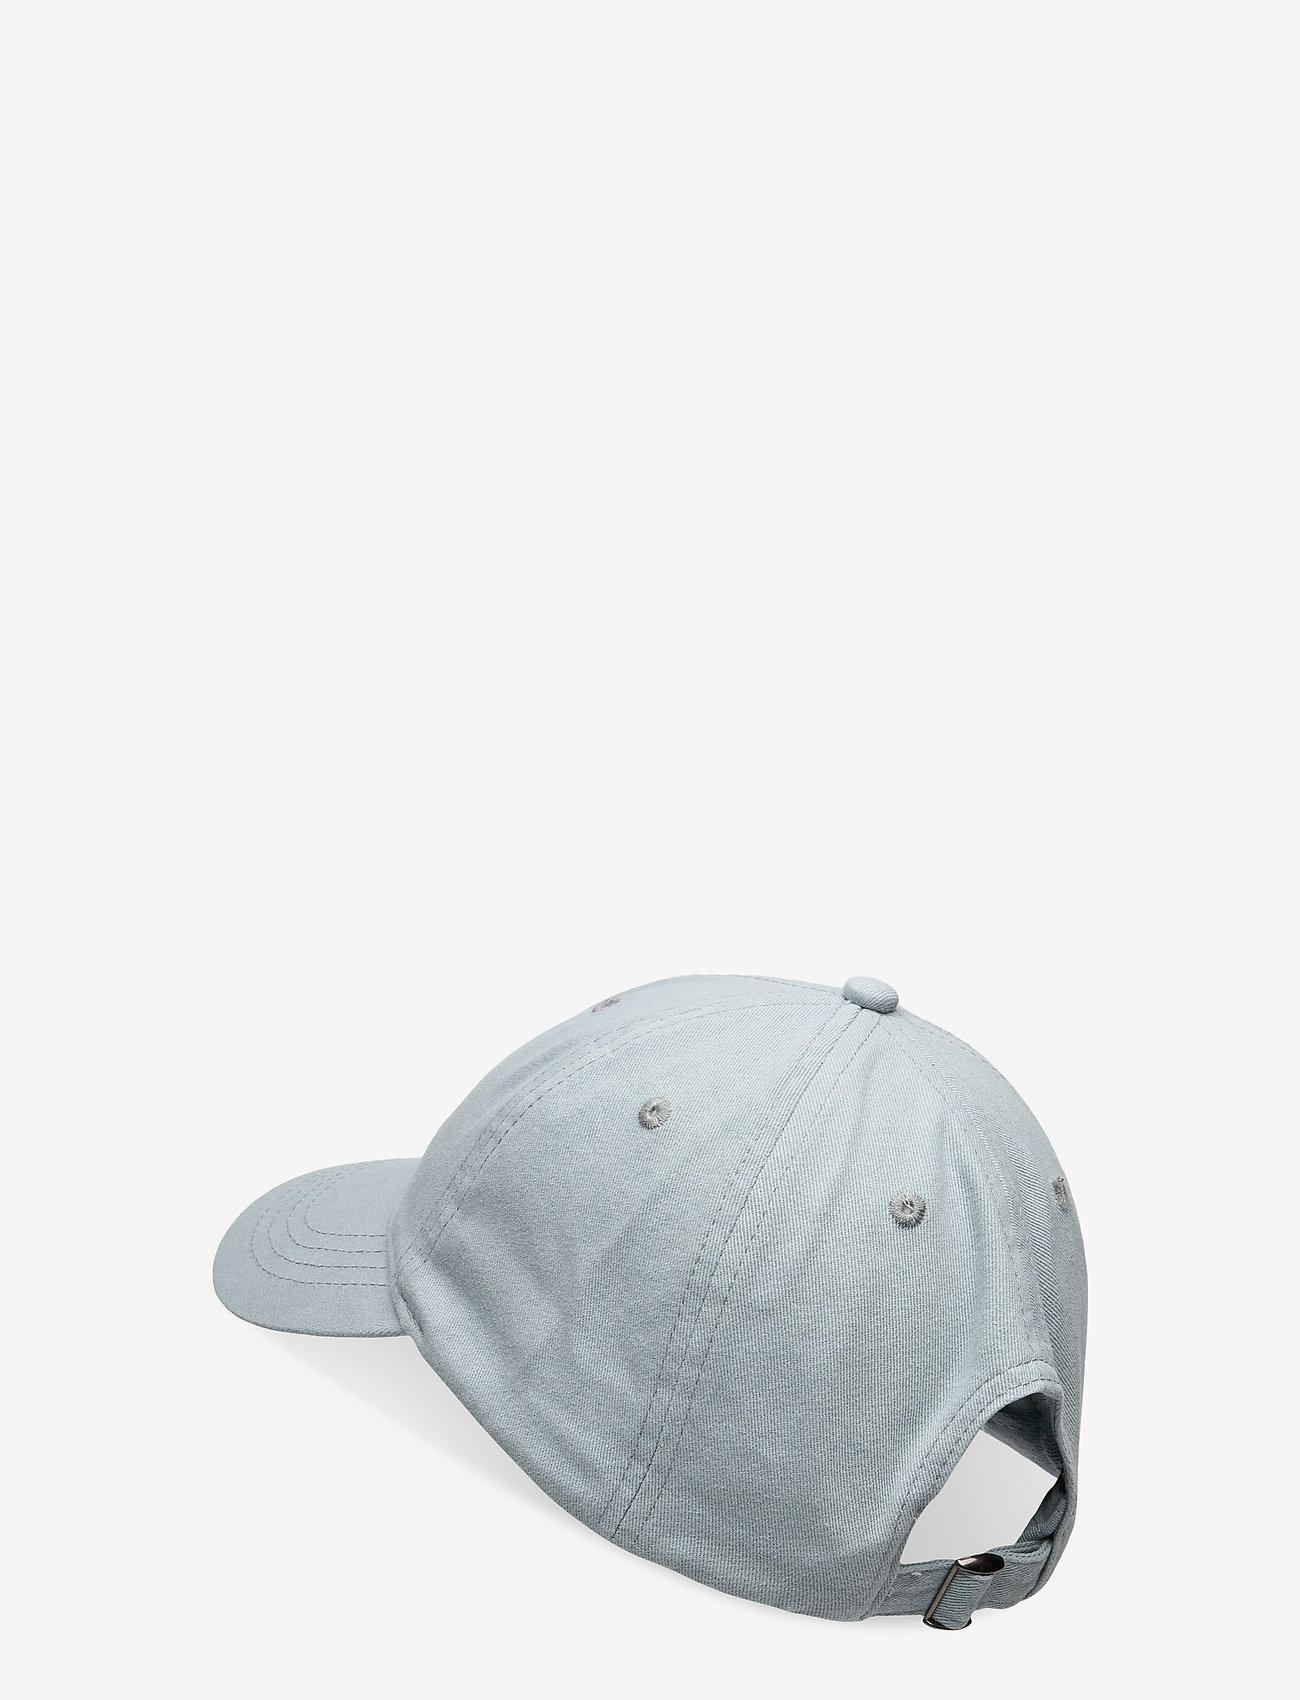 Wood Wood - Low profile twill cap - mössor & kepsar - light blue - 1